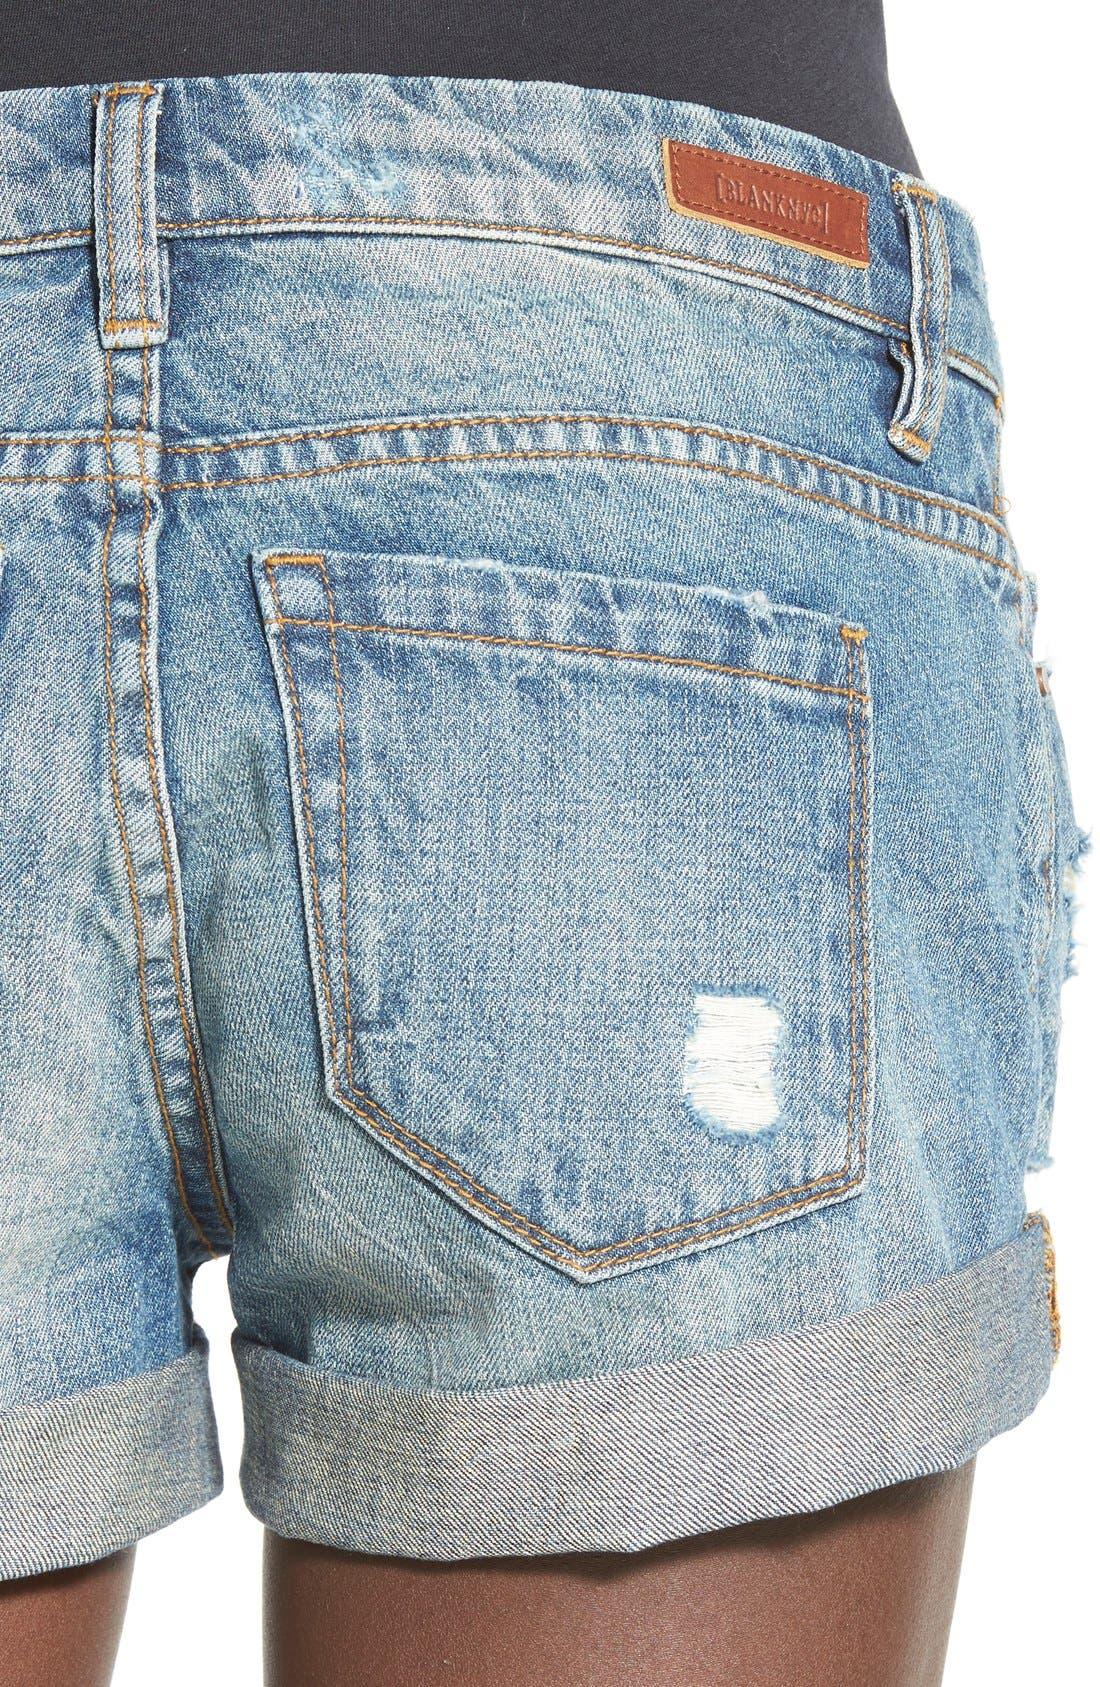 Cuffed Distressed Denim Shorts,                             Alternate thumbnail 3, color,                             400